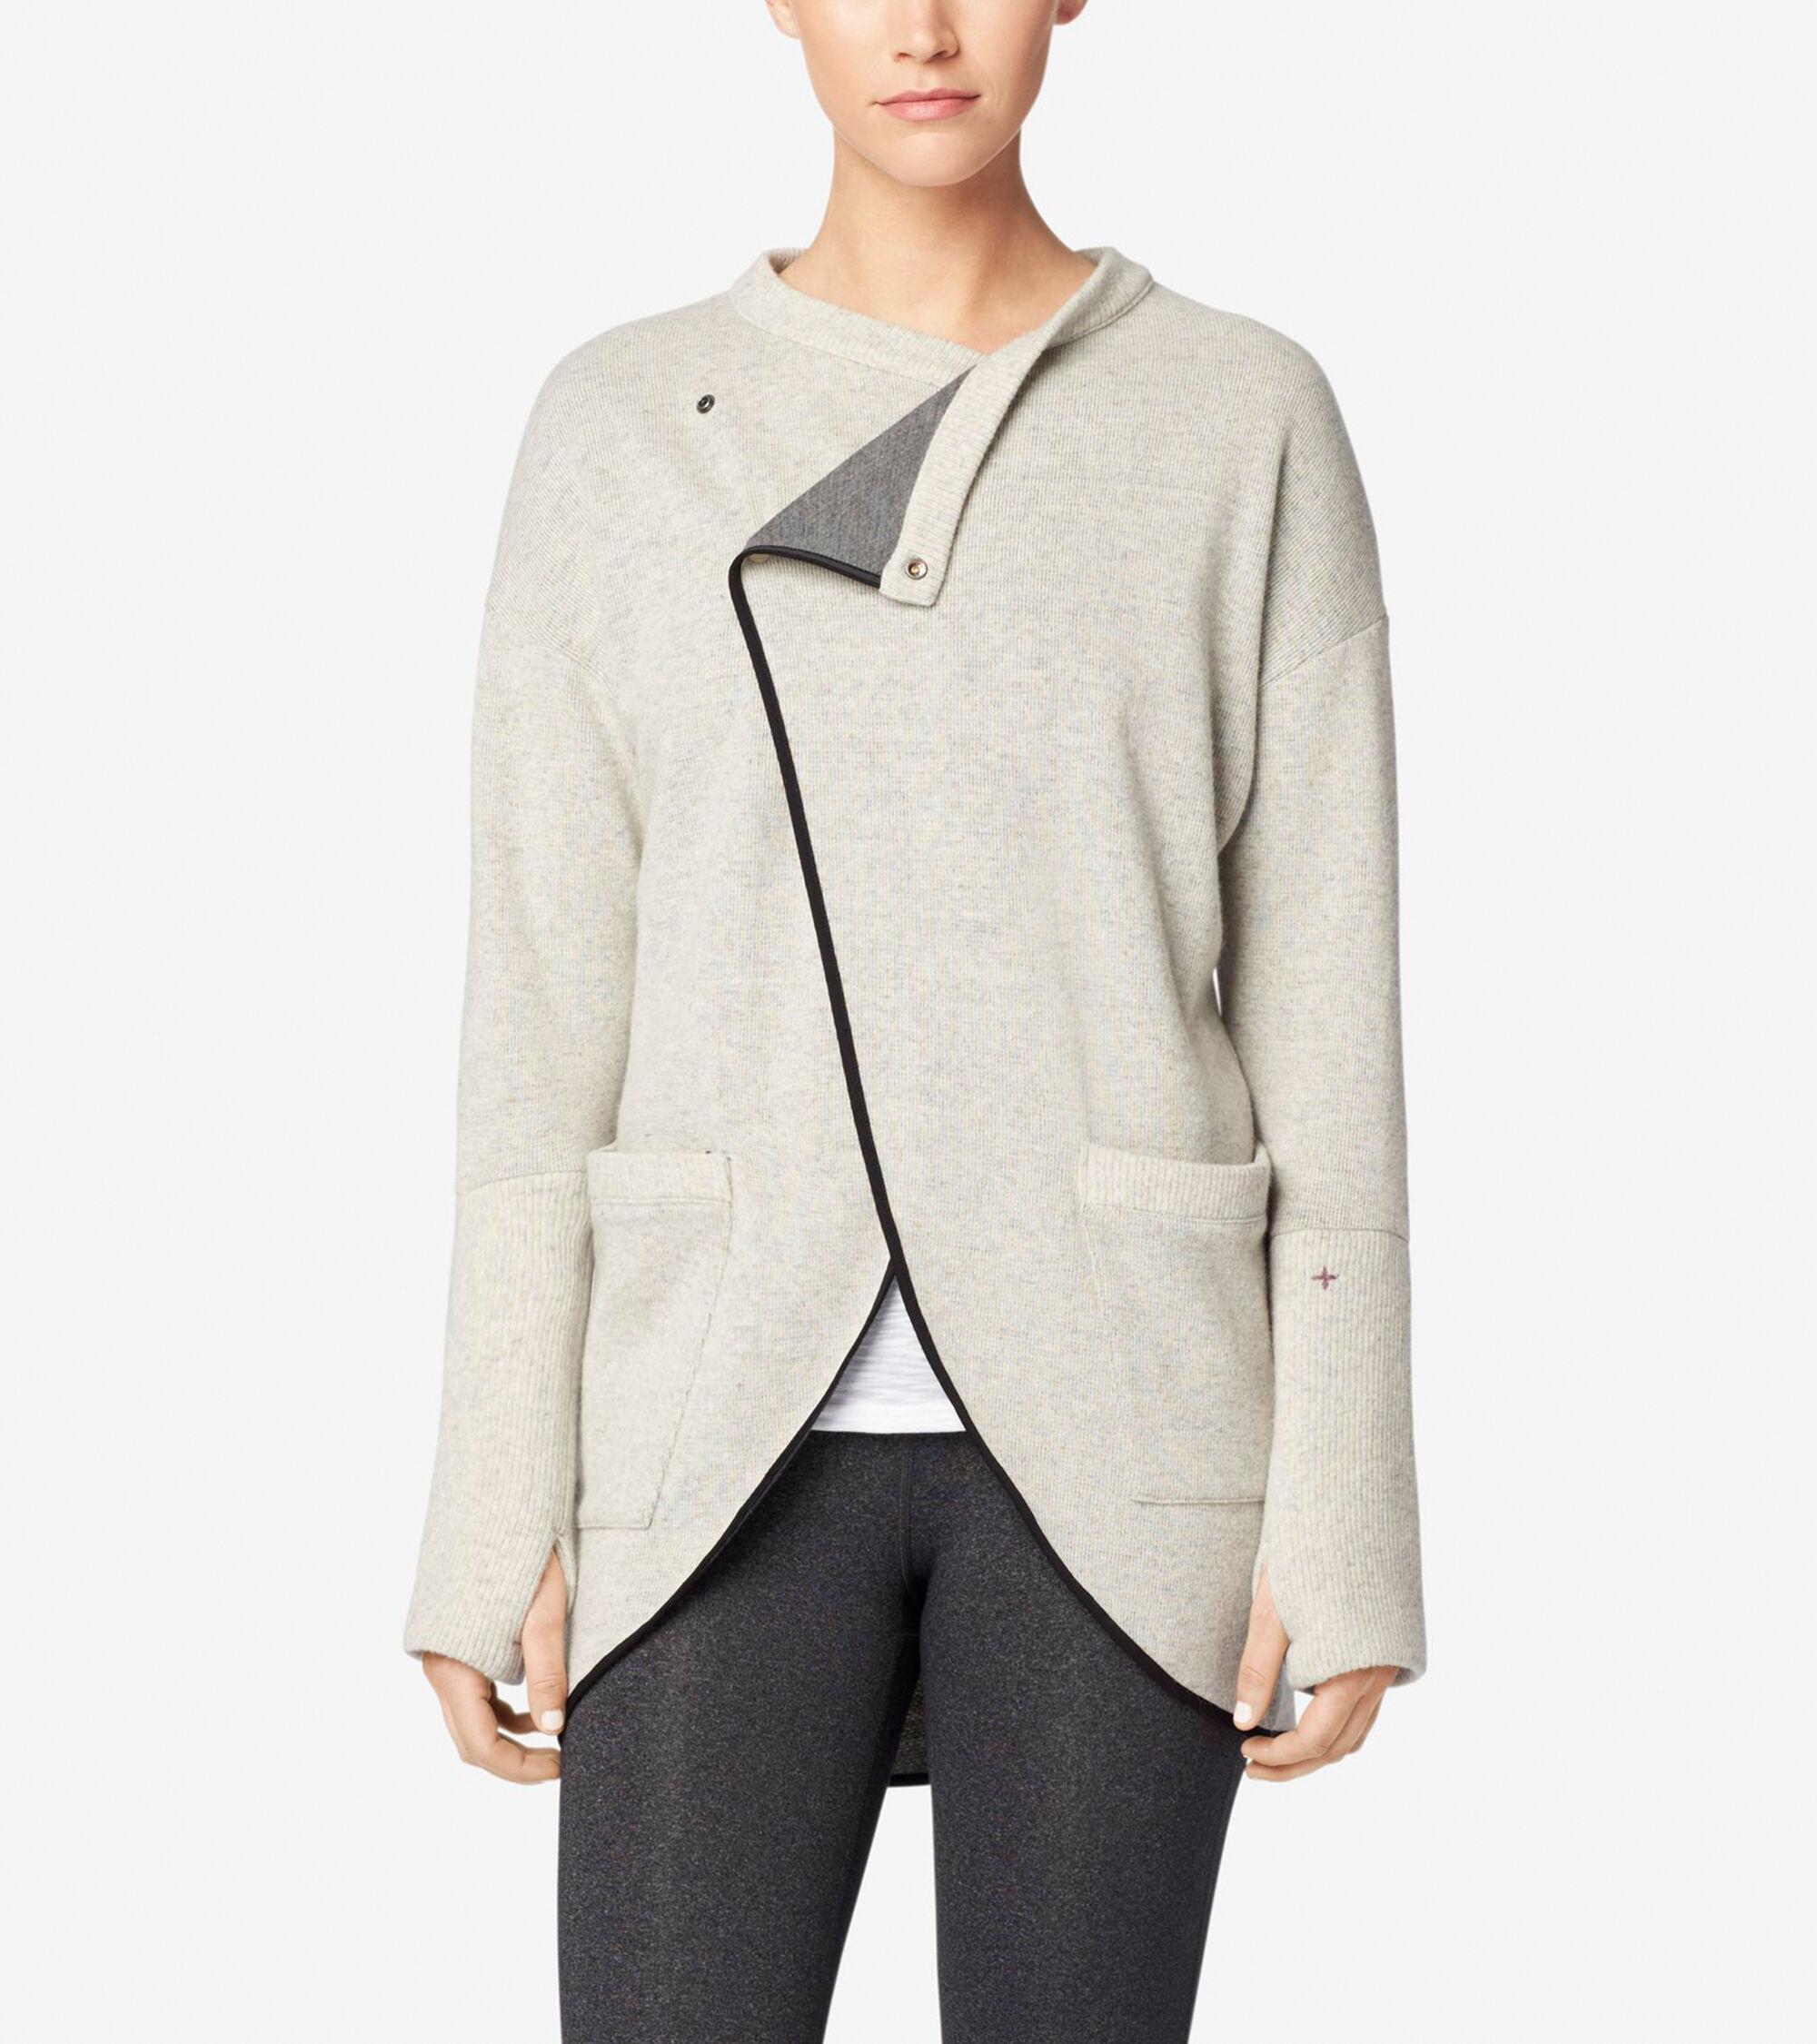 Grand > StudiøGrand Synchronize Sweater